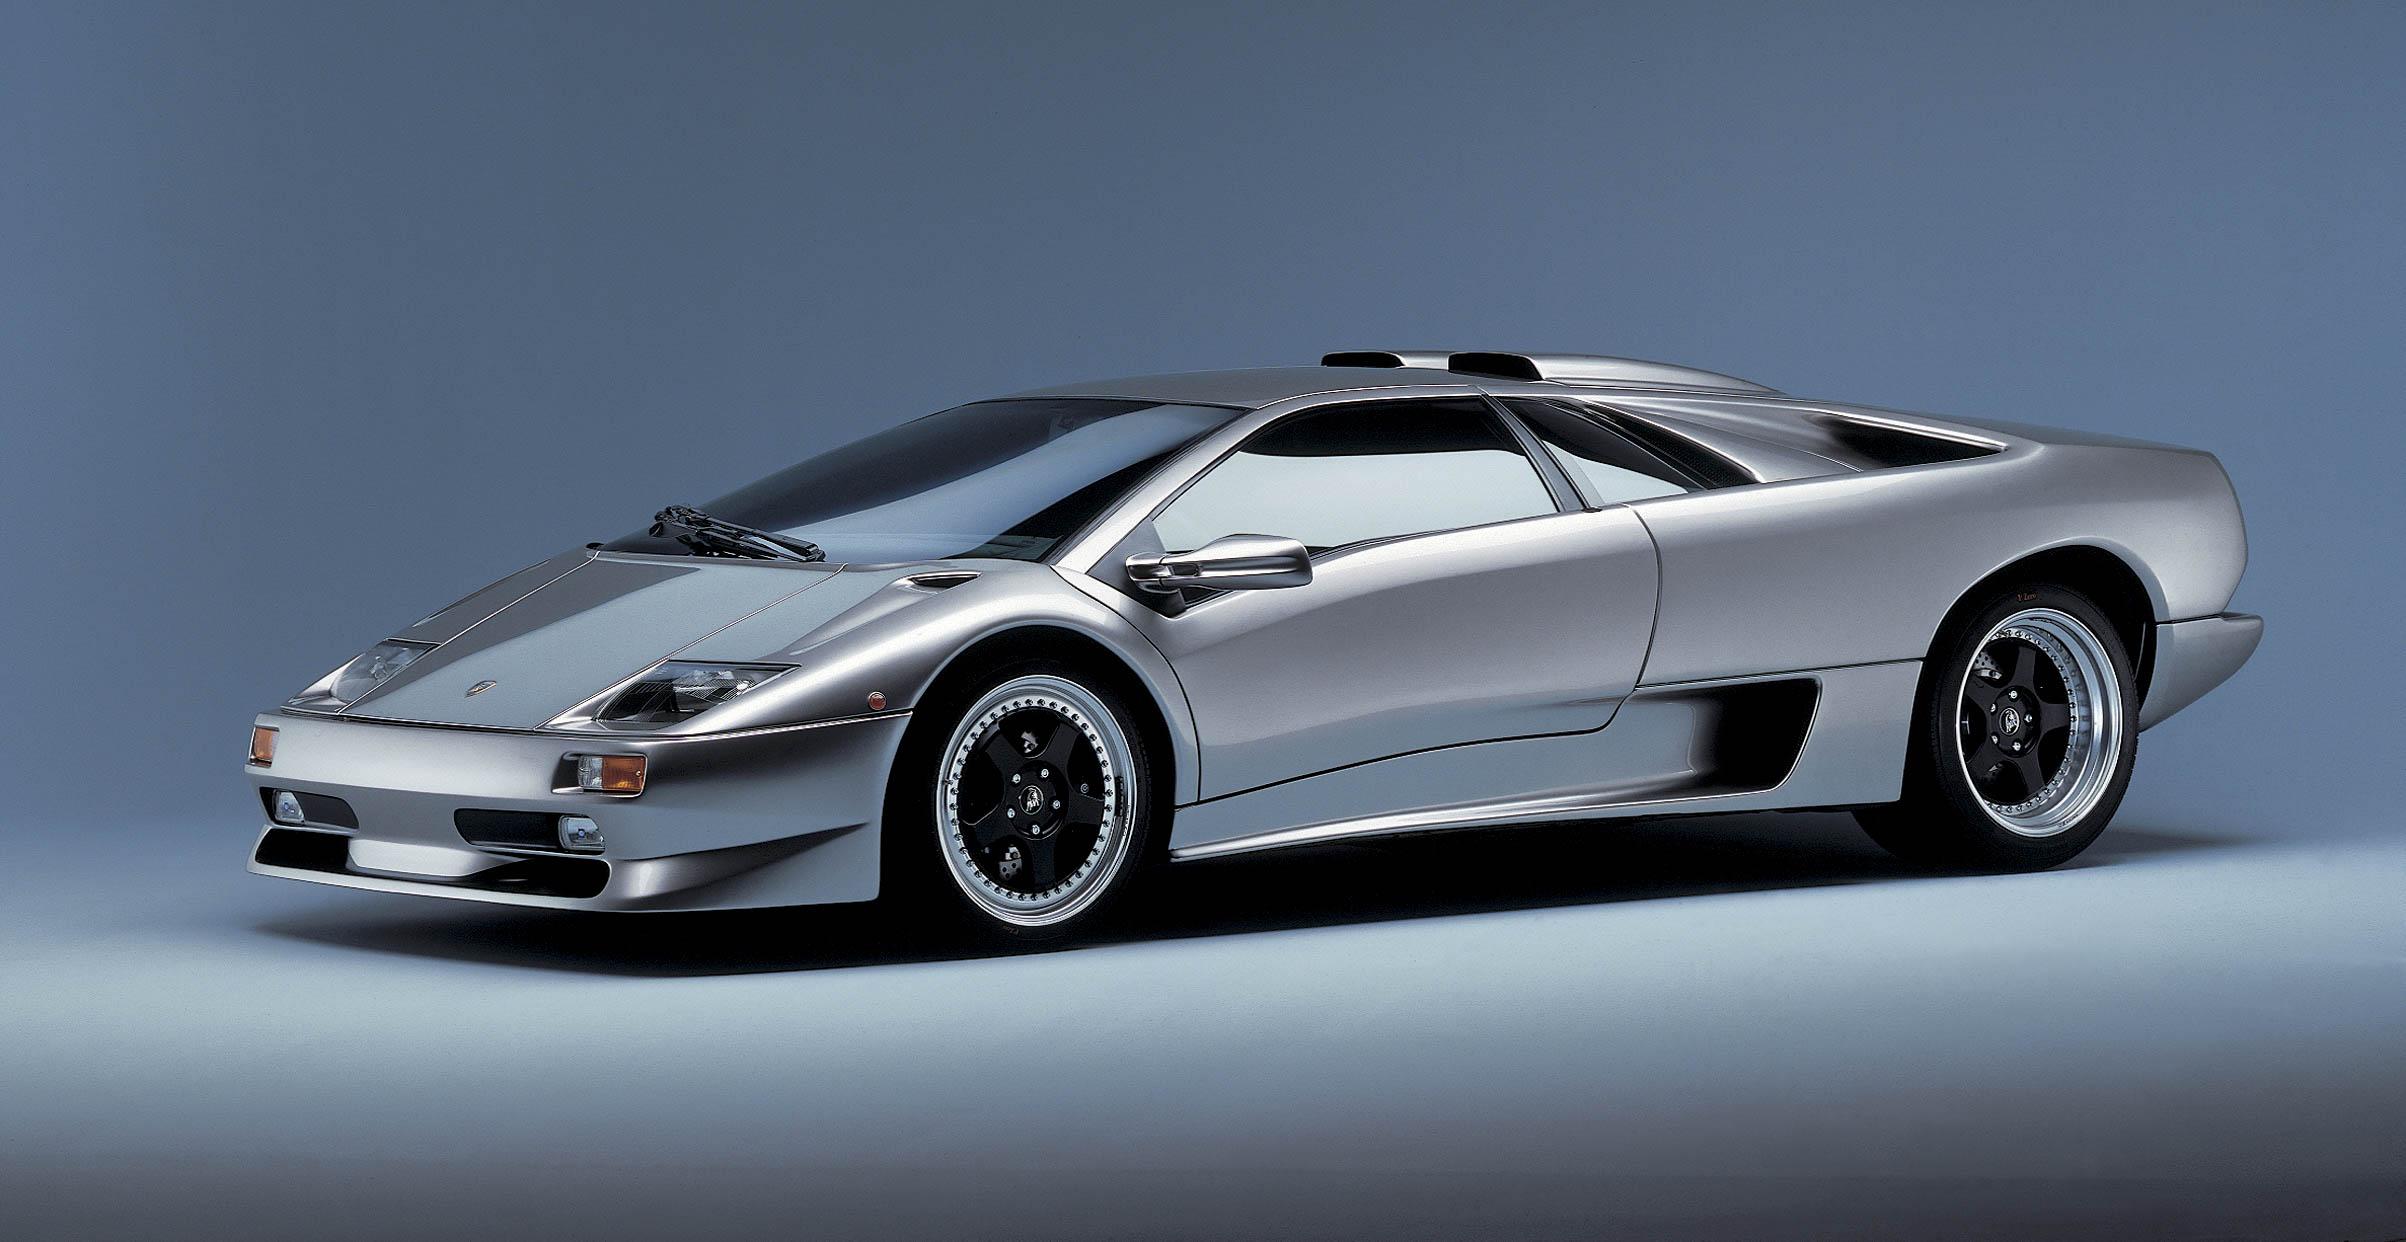 Lamborghini Diablo front 3/4